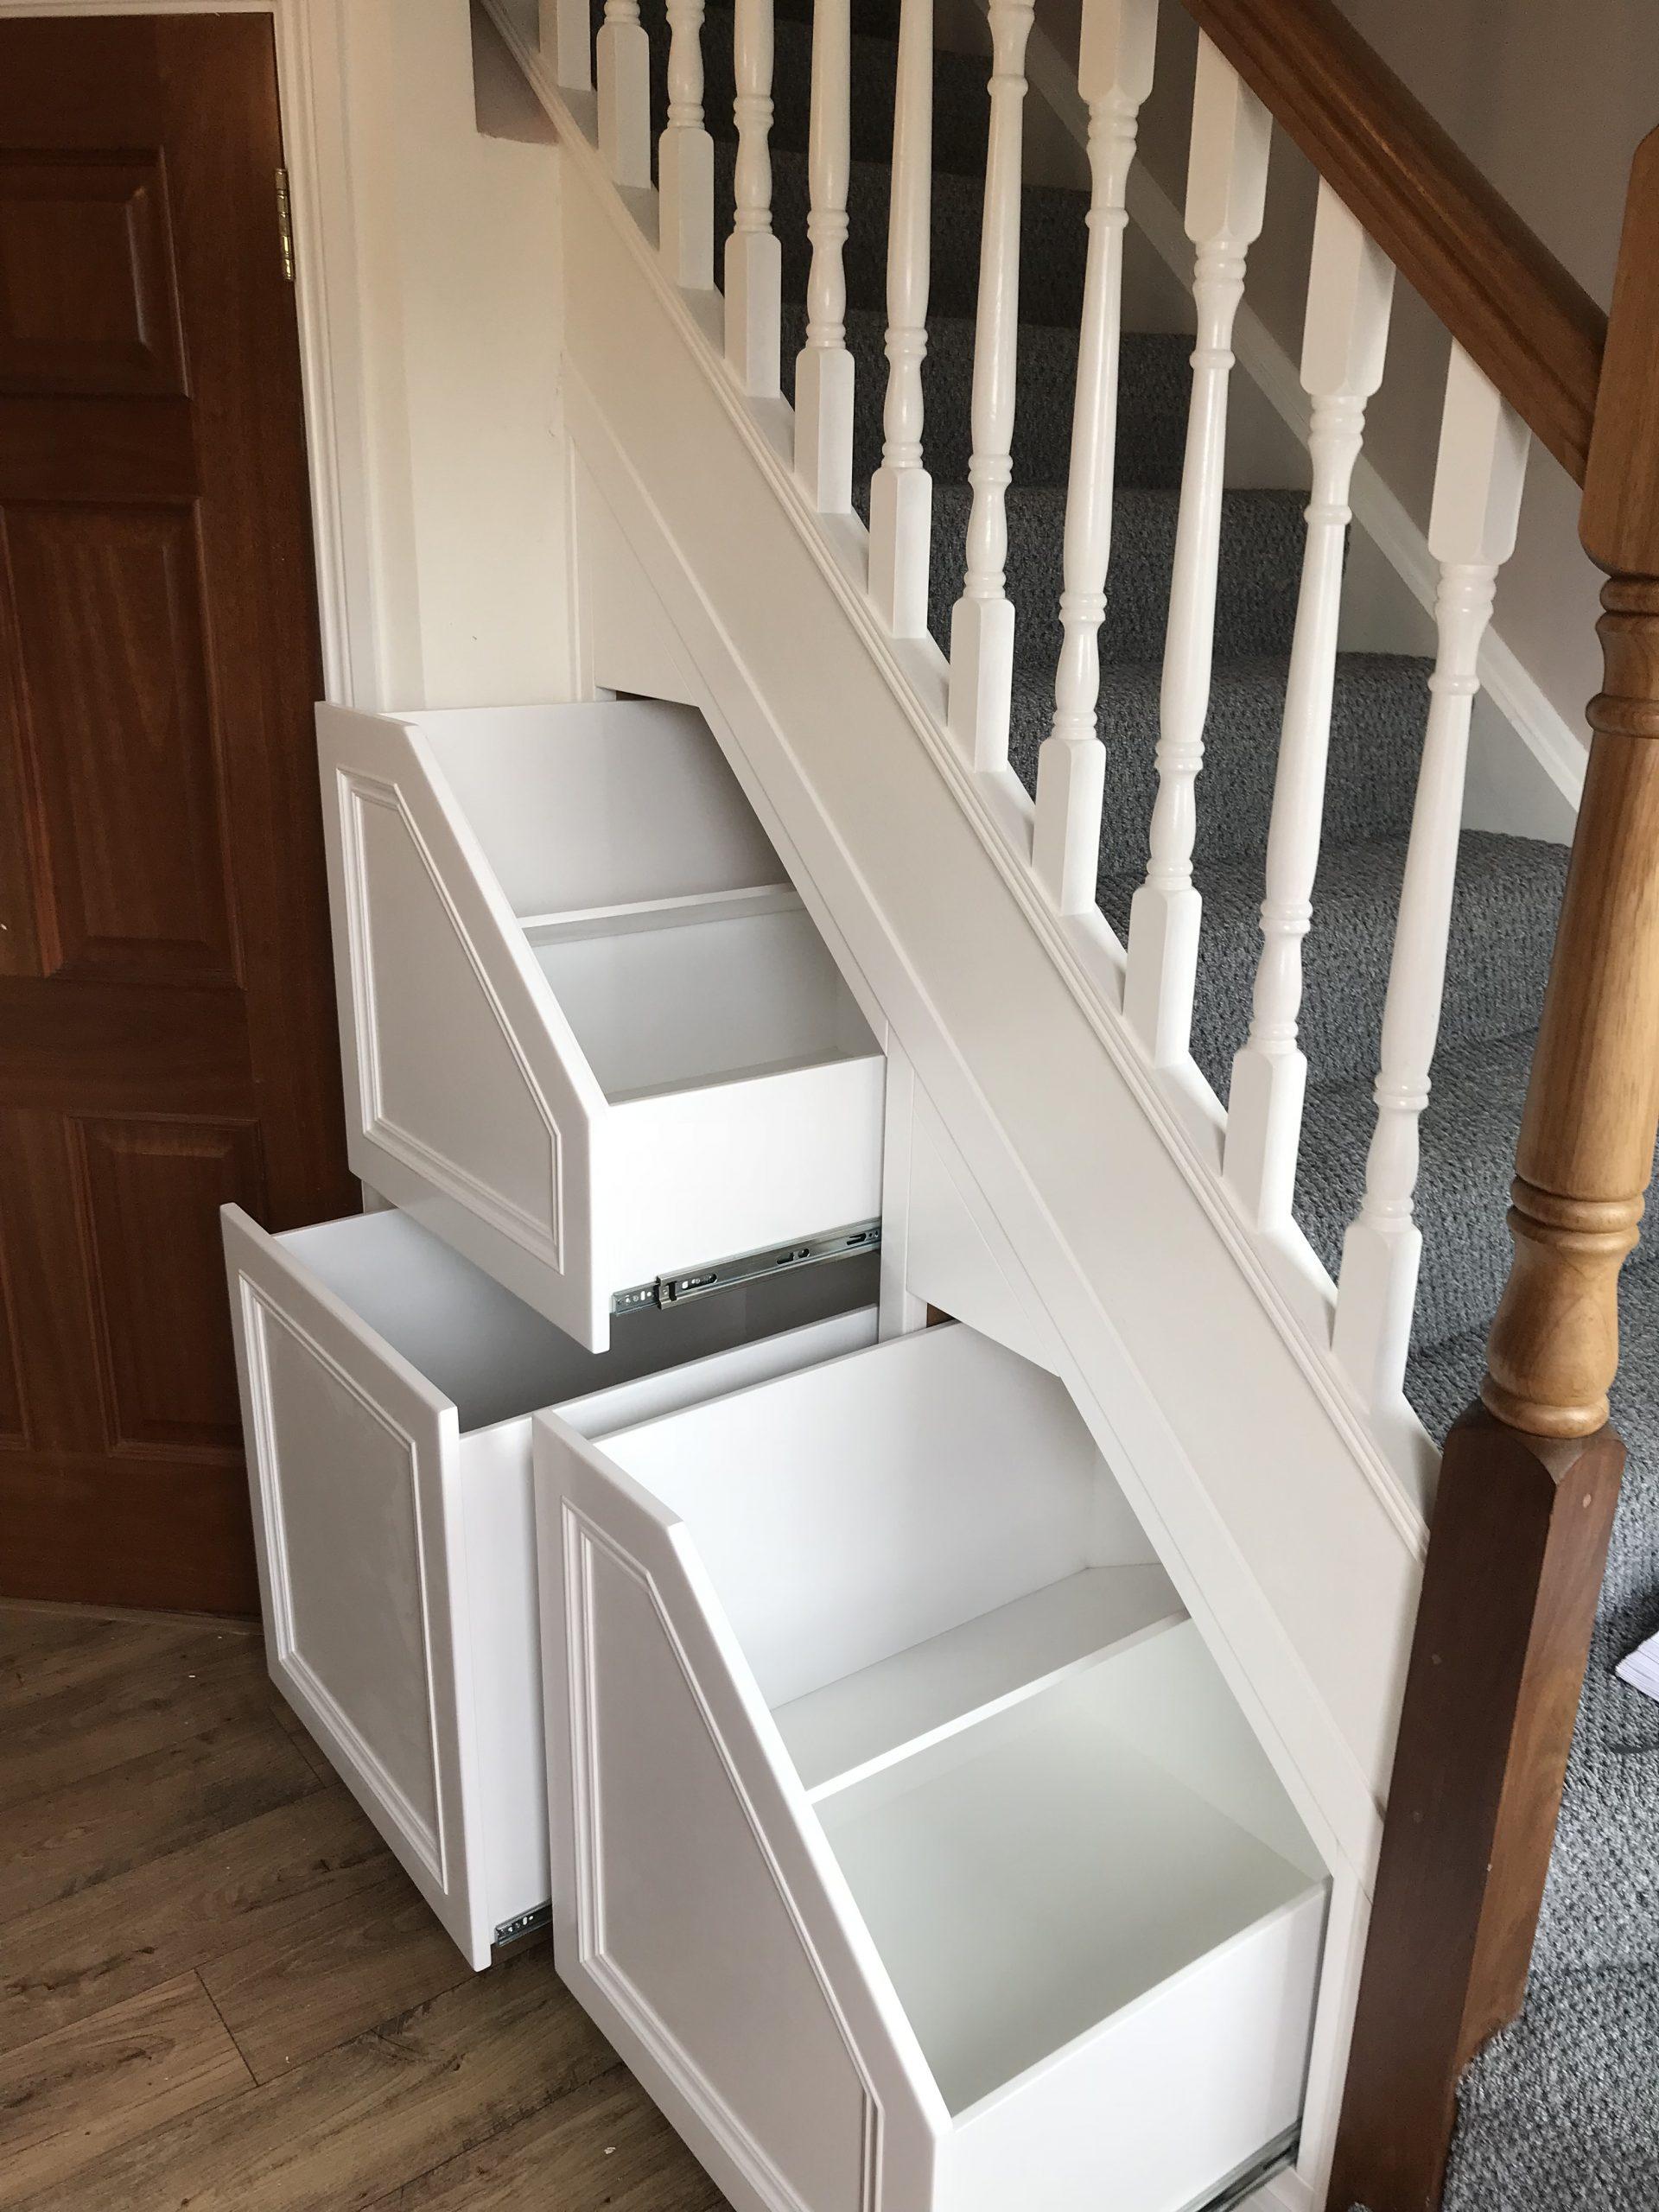 Three drawer white insides